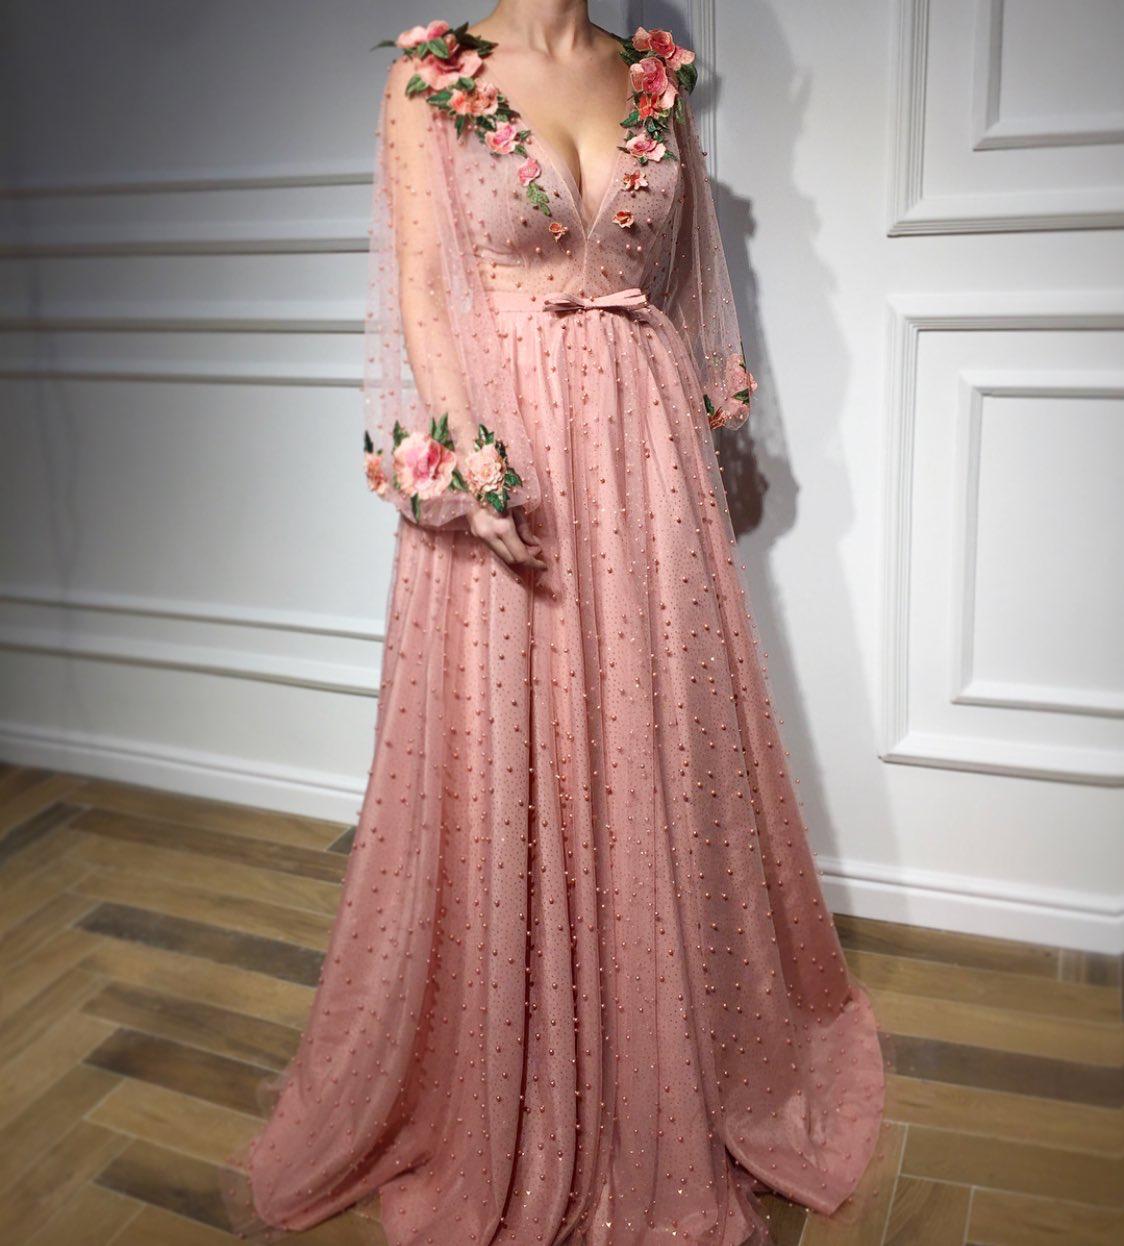 Pin de luiza en vestidos diferentes | Pinterest | Vestidos ...